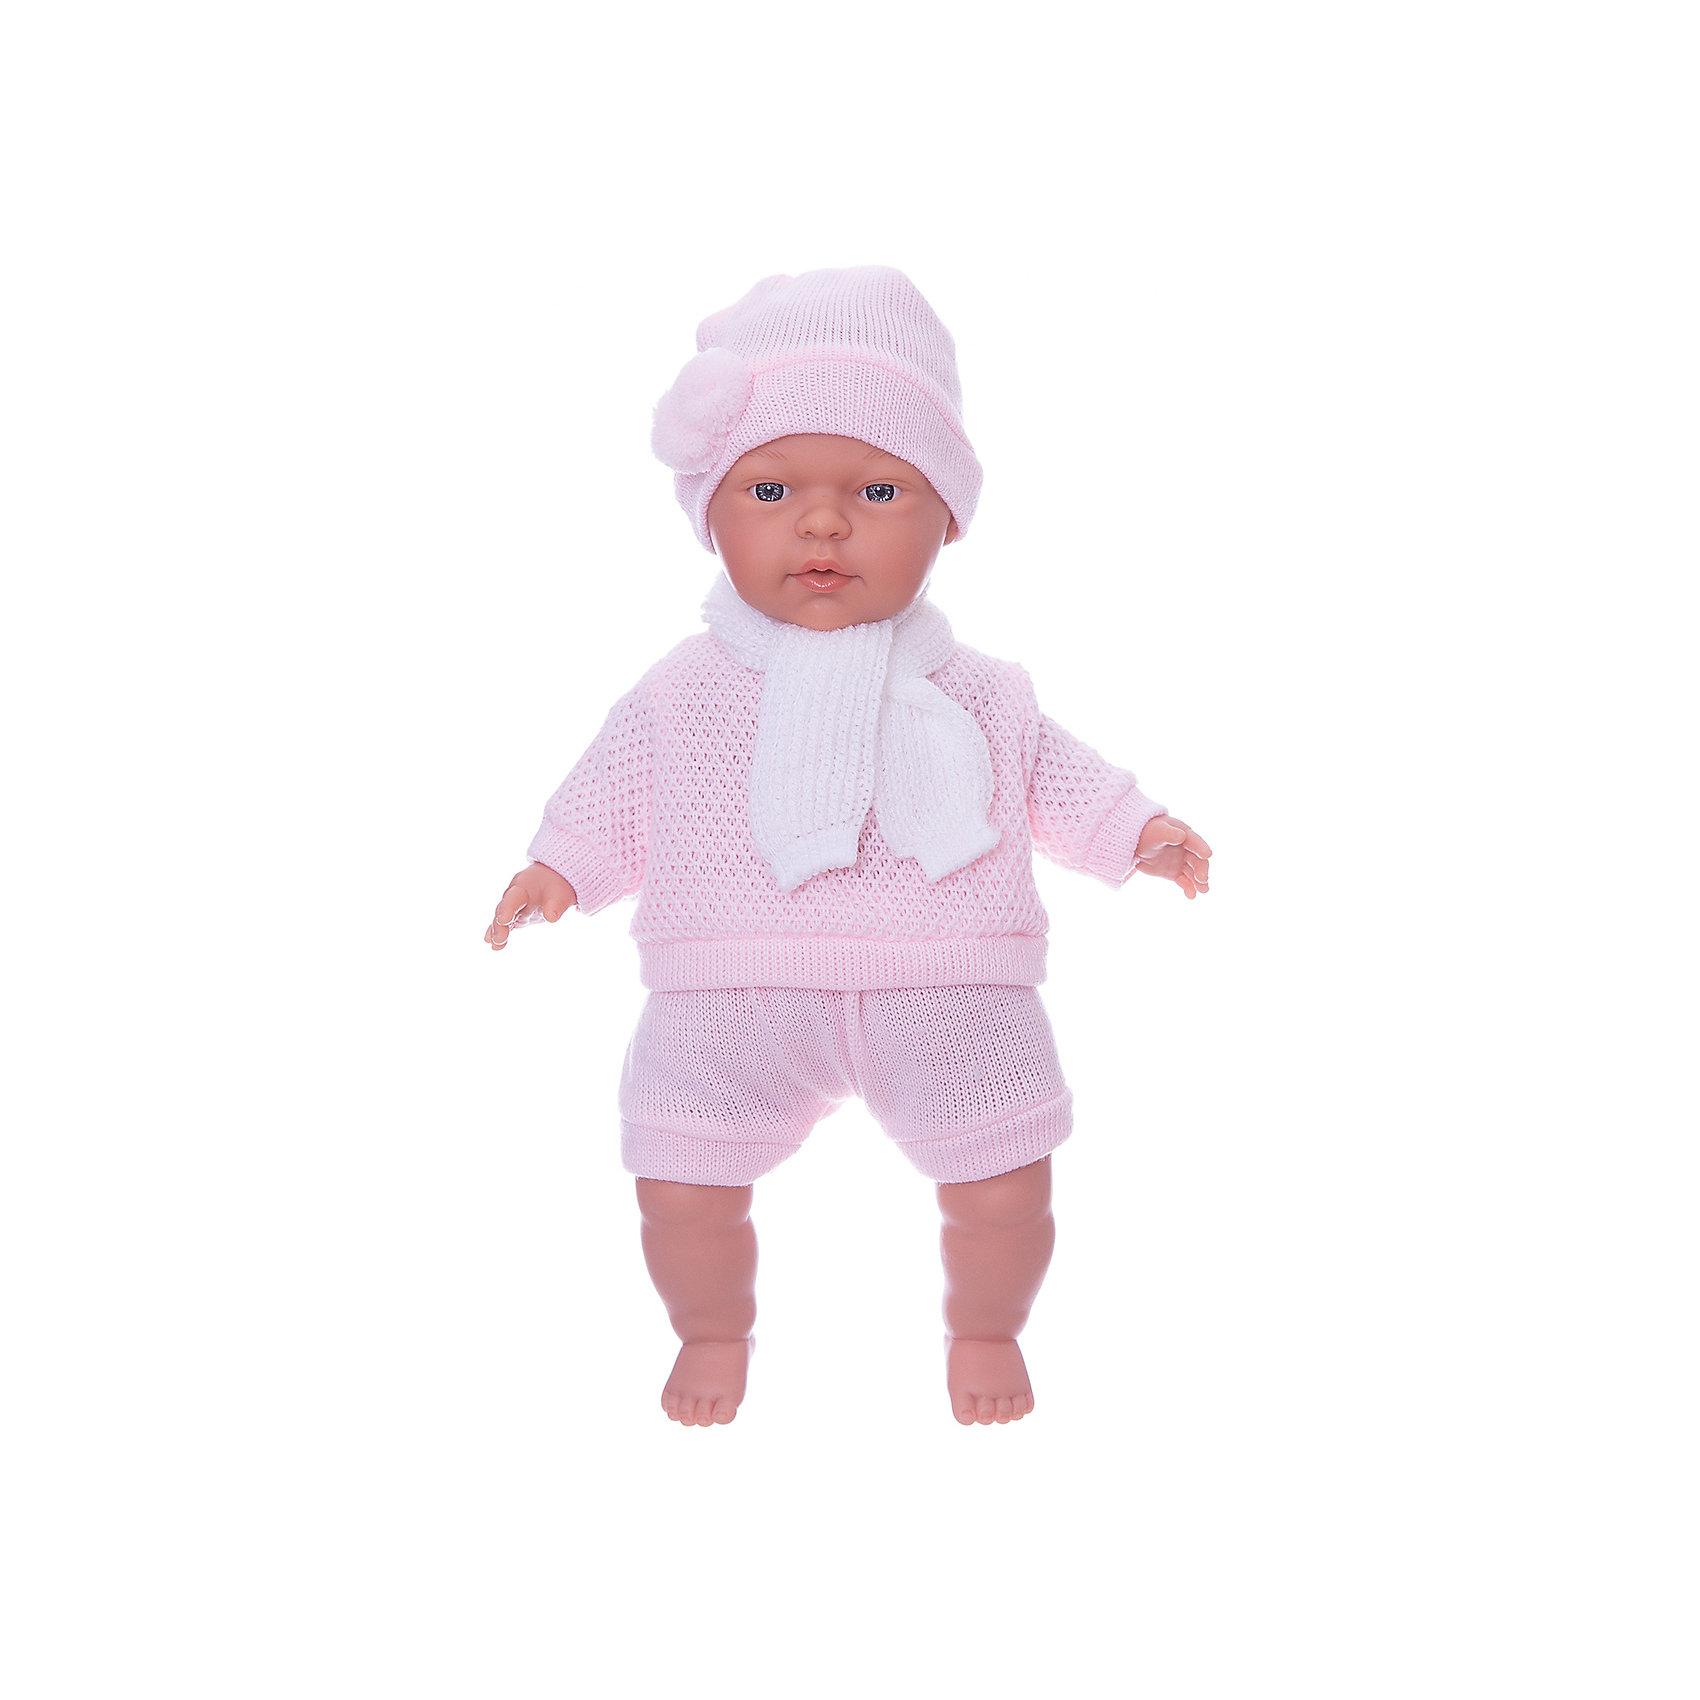 Llorens Кукла Люсия, 33 см, Llorens куклы и одежда для кукол llorens кукла изабела 33 см со звуком